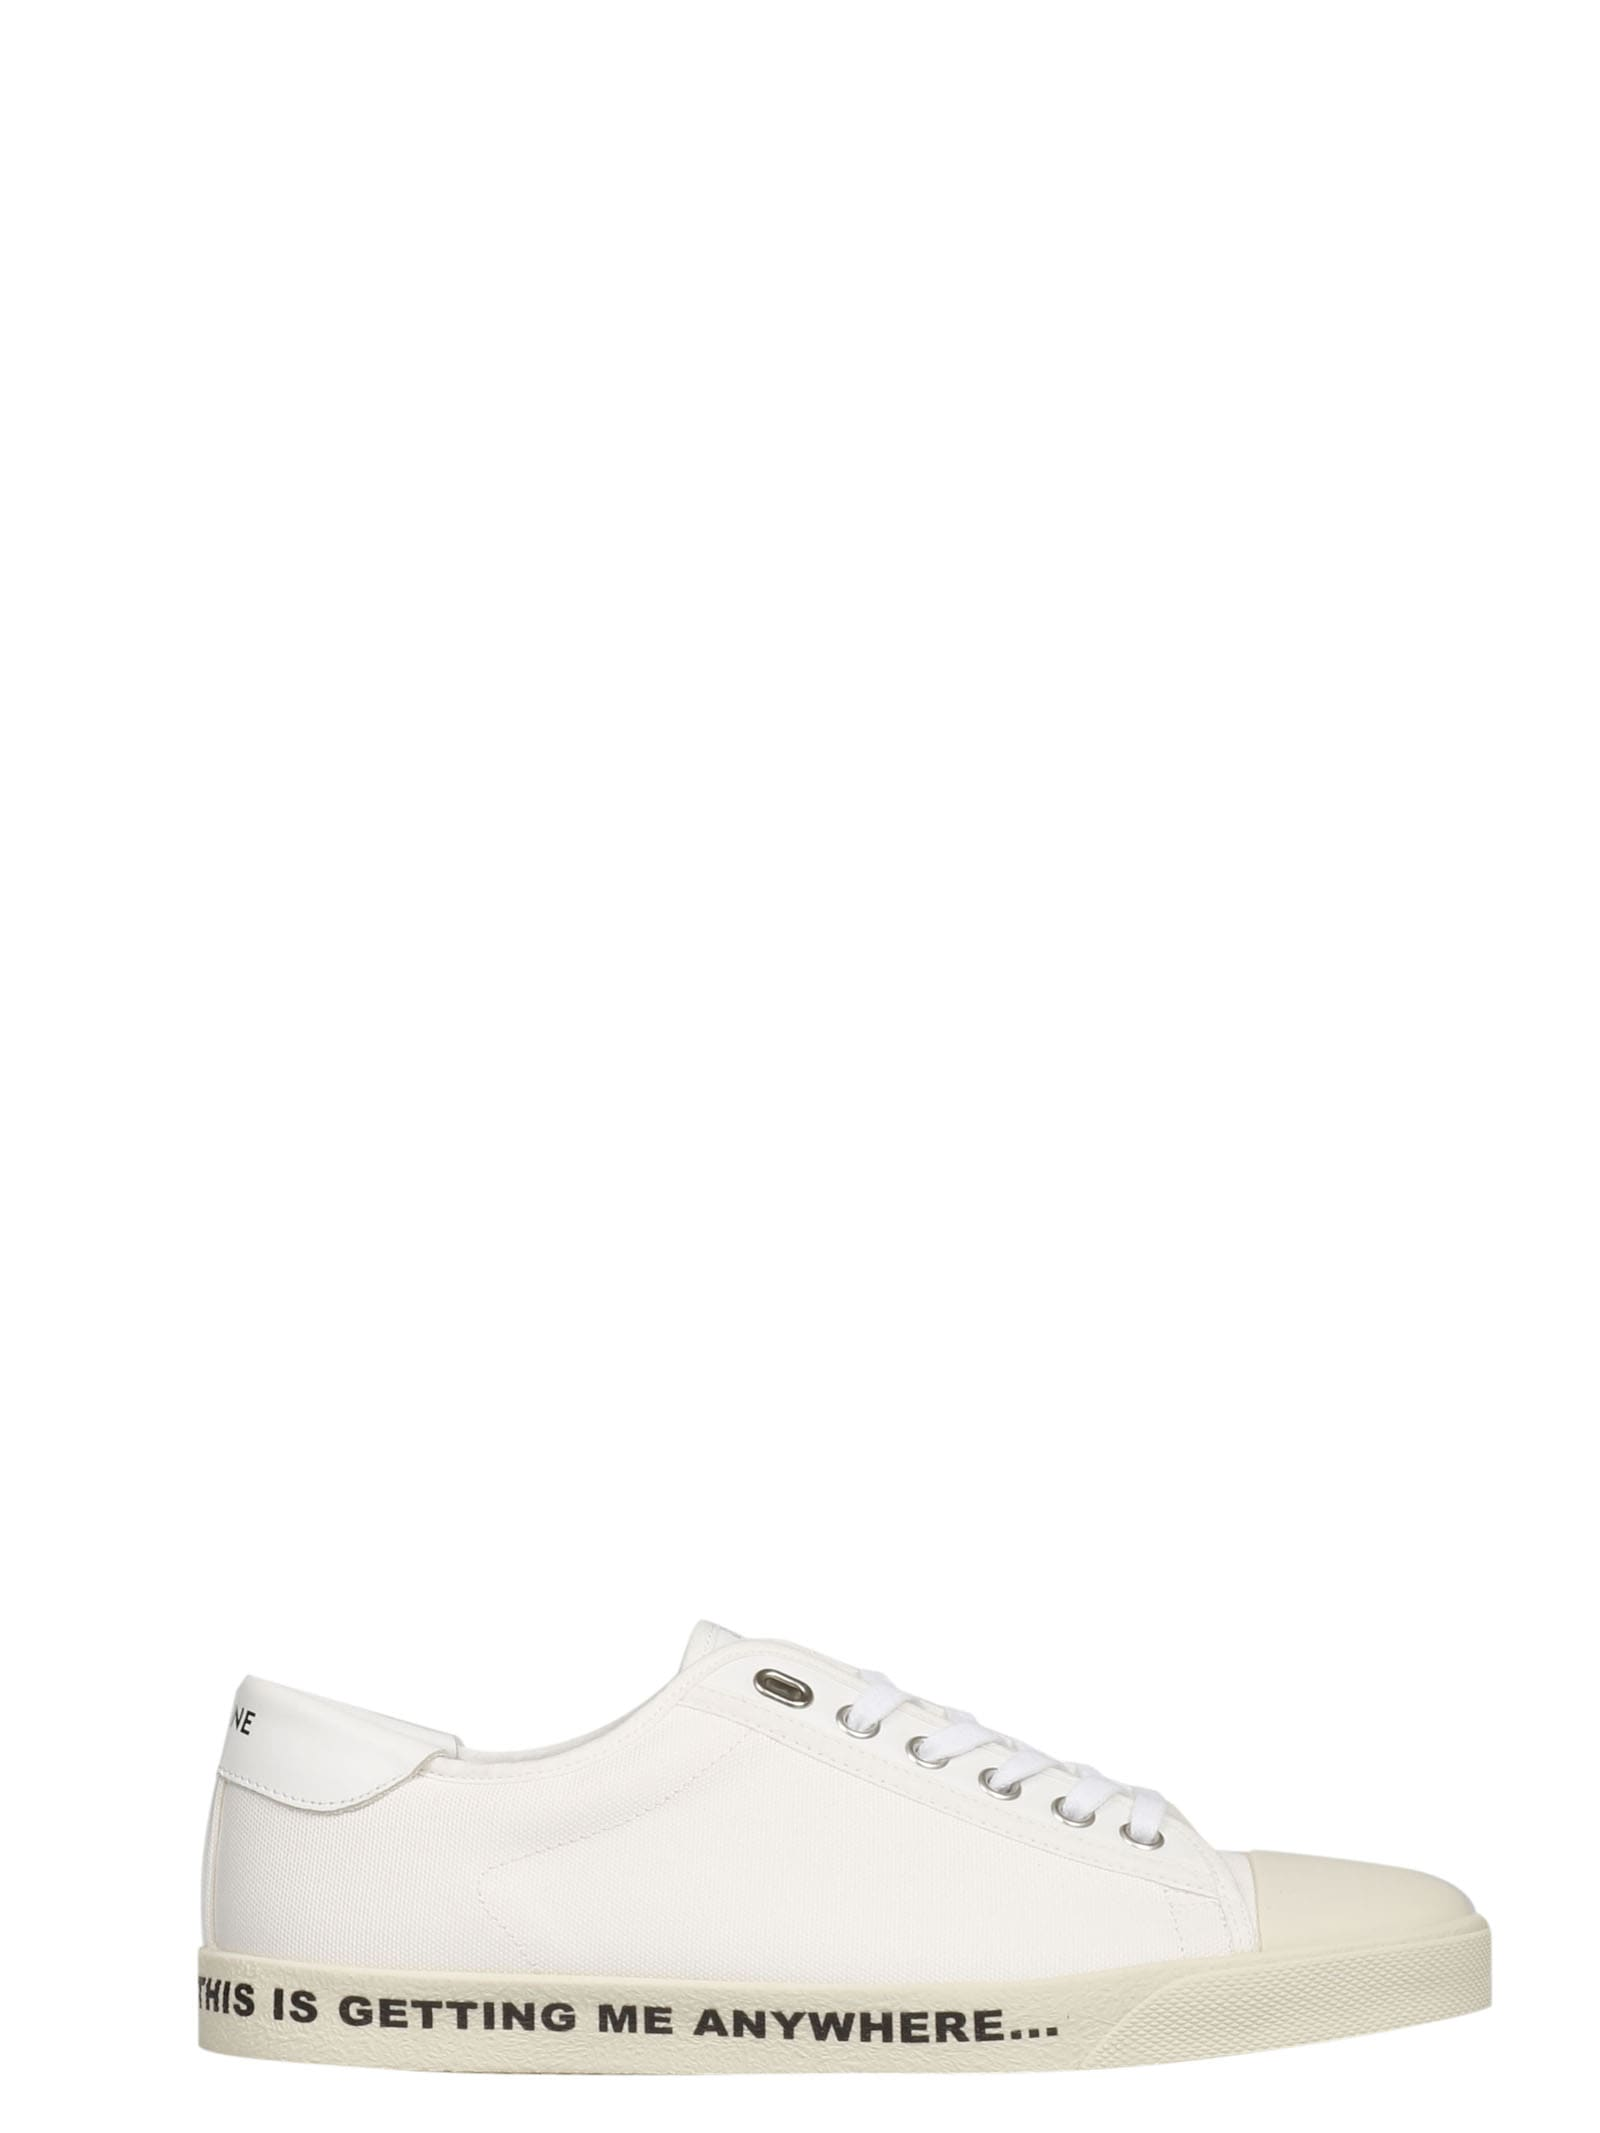 Celine Shoes | italist, ALWAYS LIKE A SALE